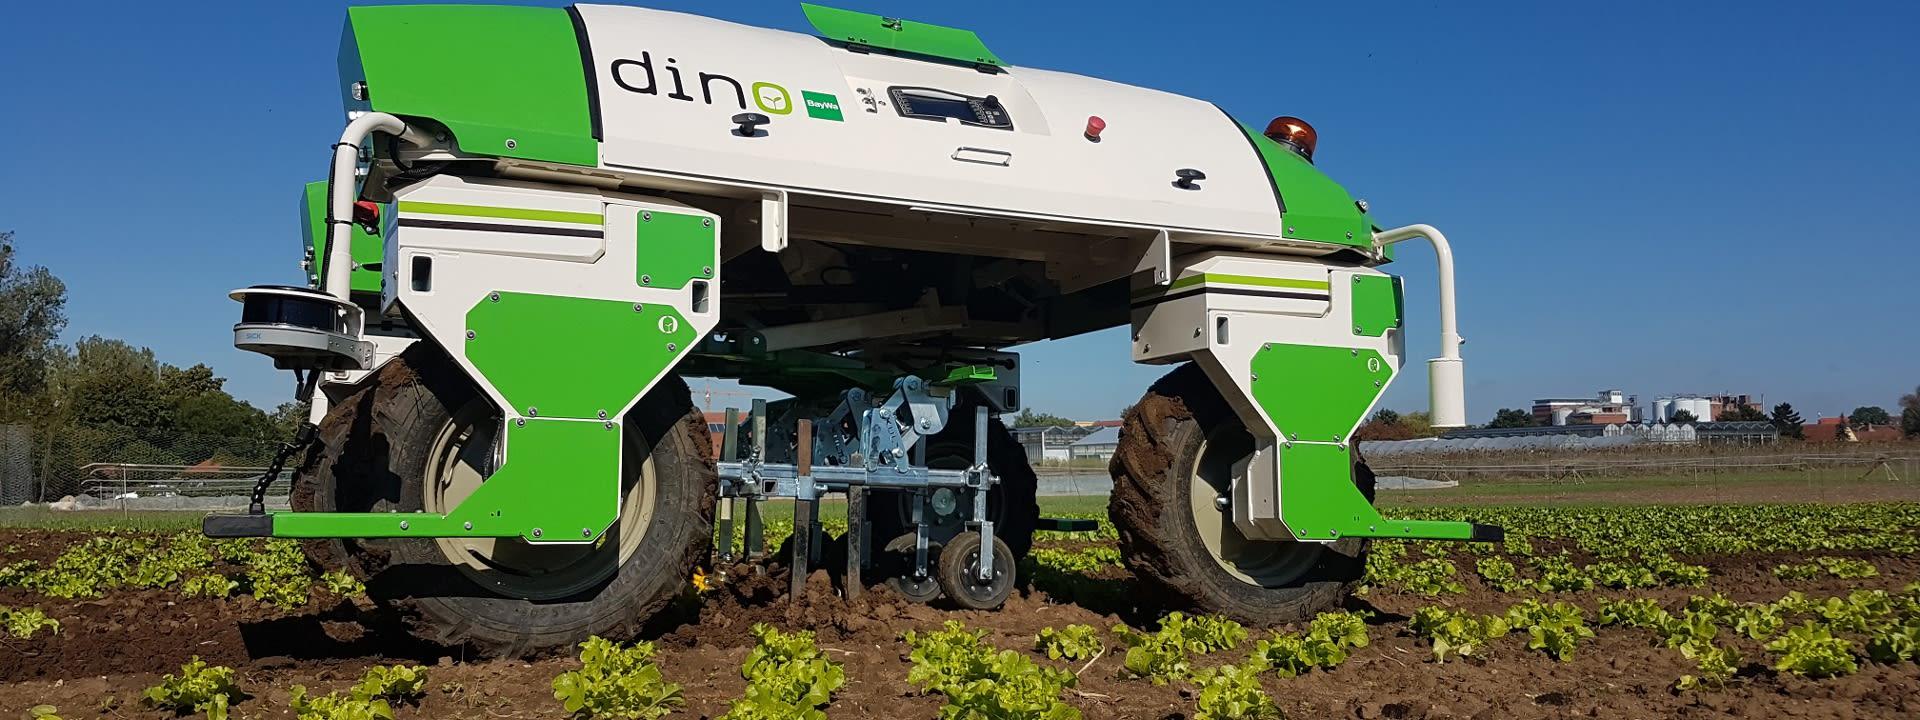 Roboter Dino auf dem Feld